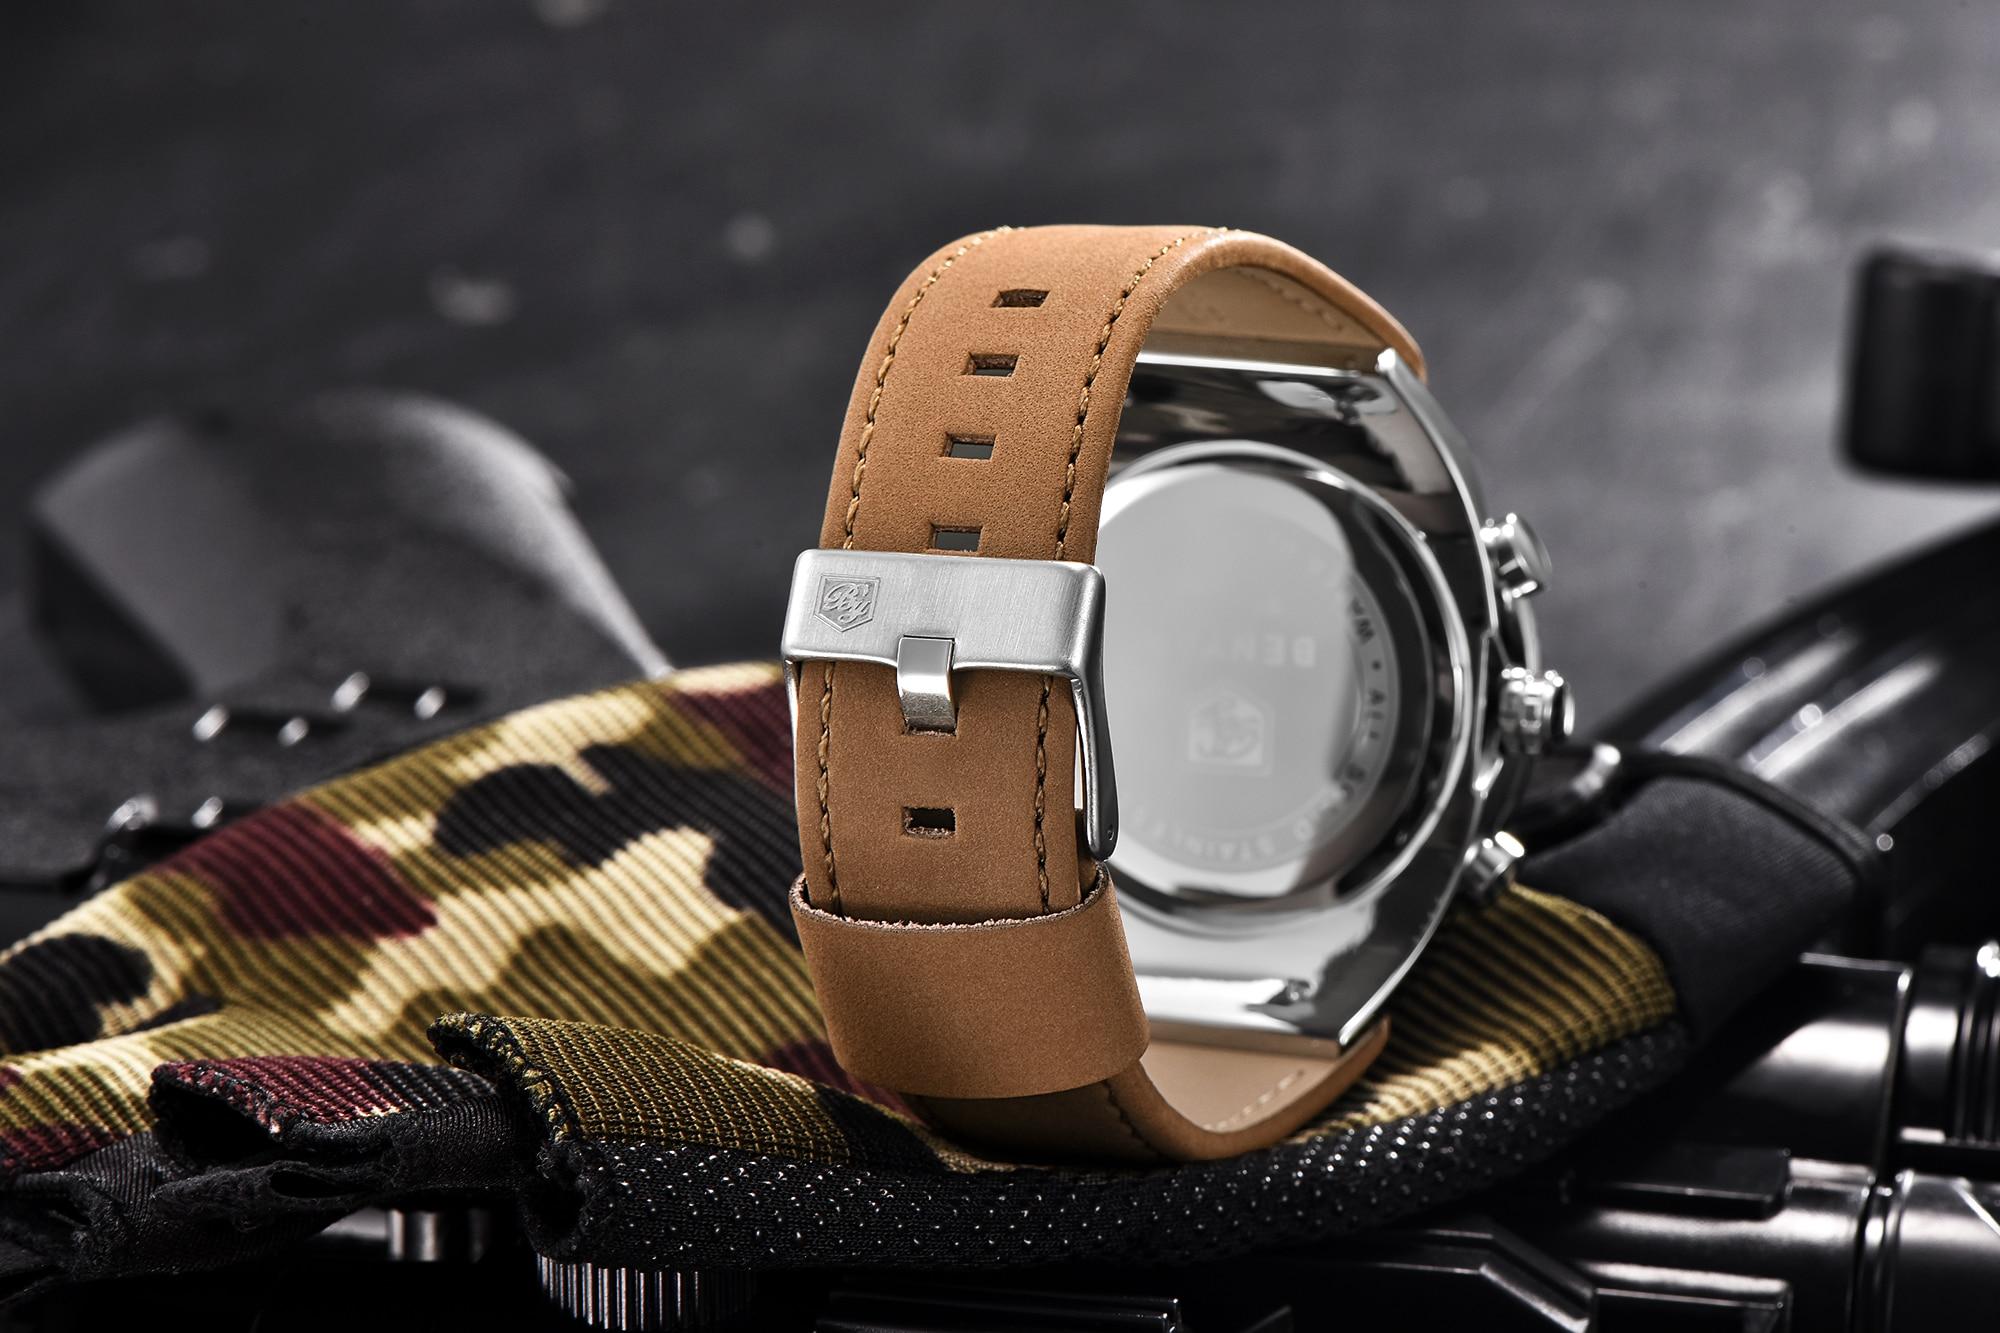 BENYAR Big Dial Sport Watch Men Waterproof Outdoor Military Chronograph Quartz Leather Watch Army Male Clock Relogio Masculino 5